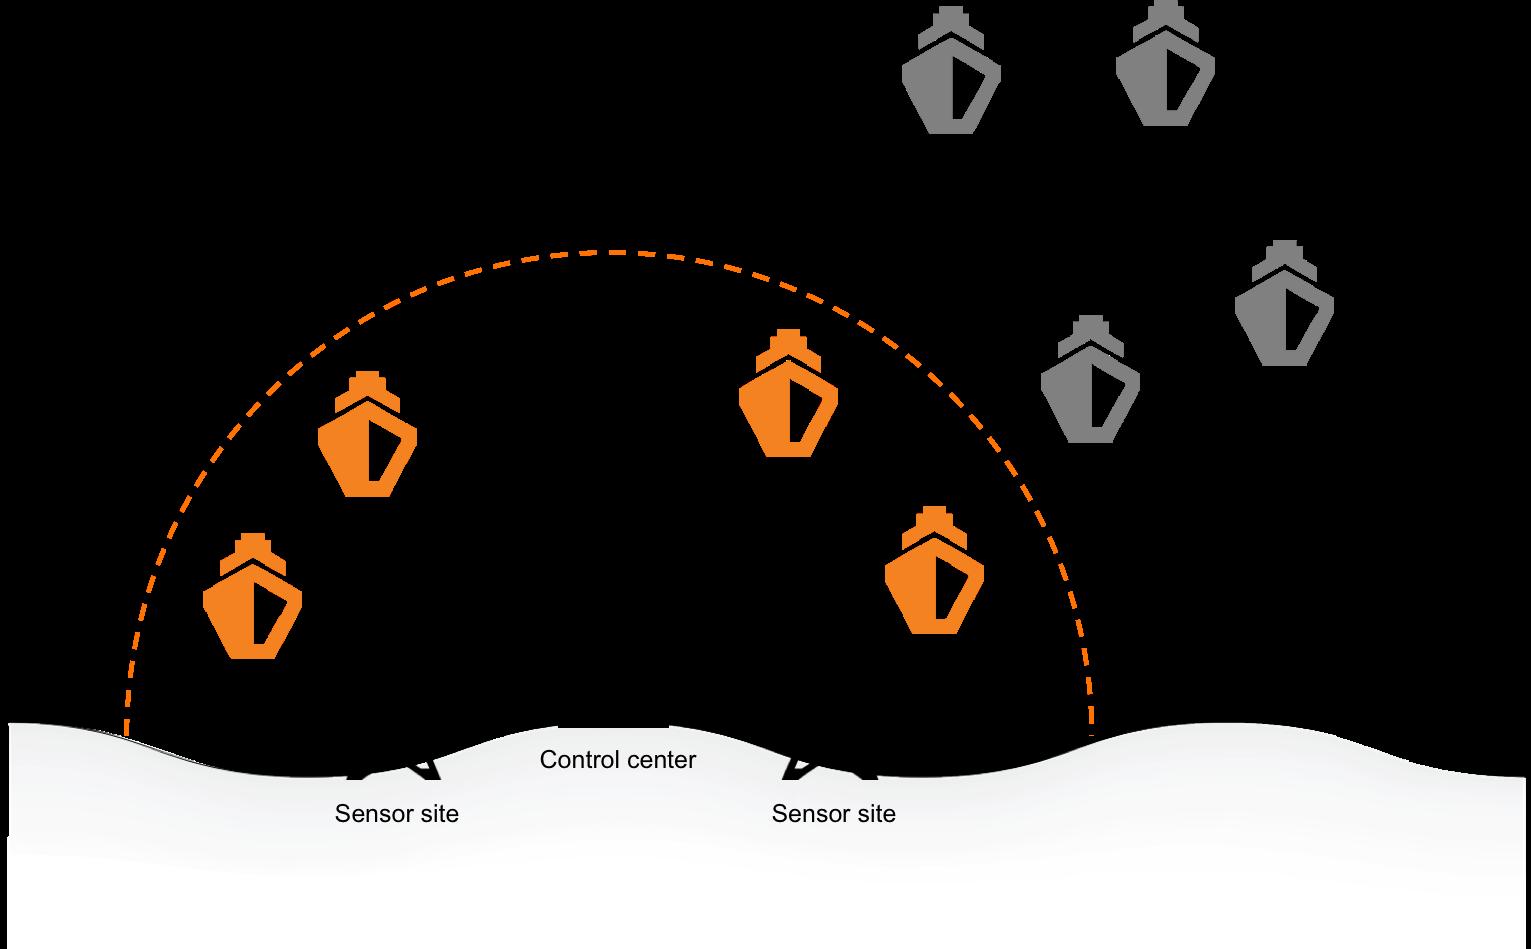 VTS process